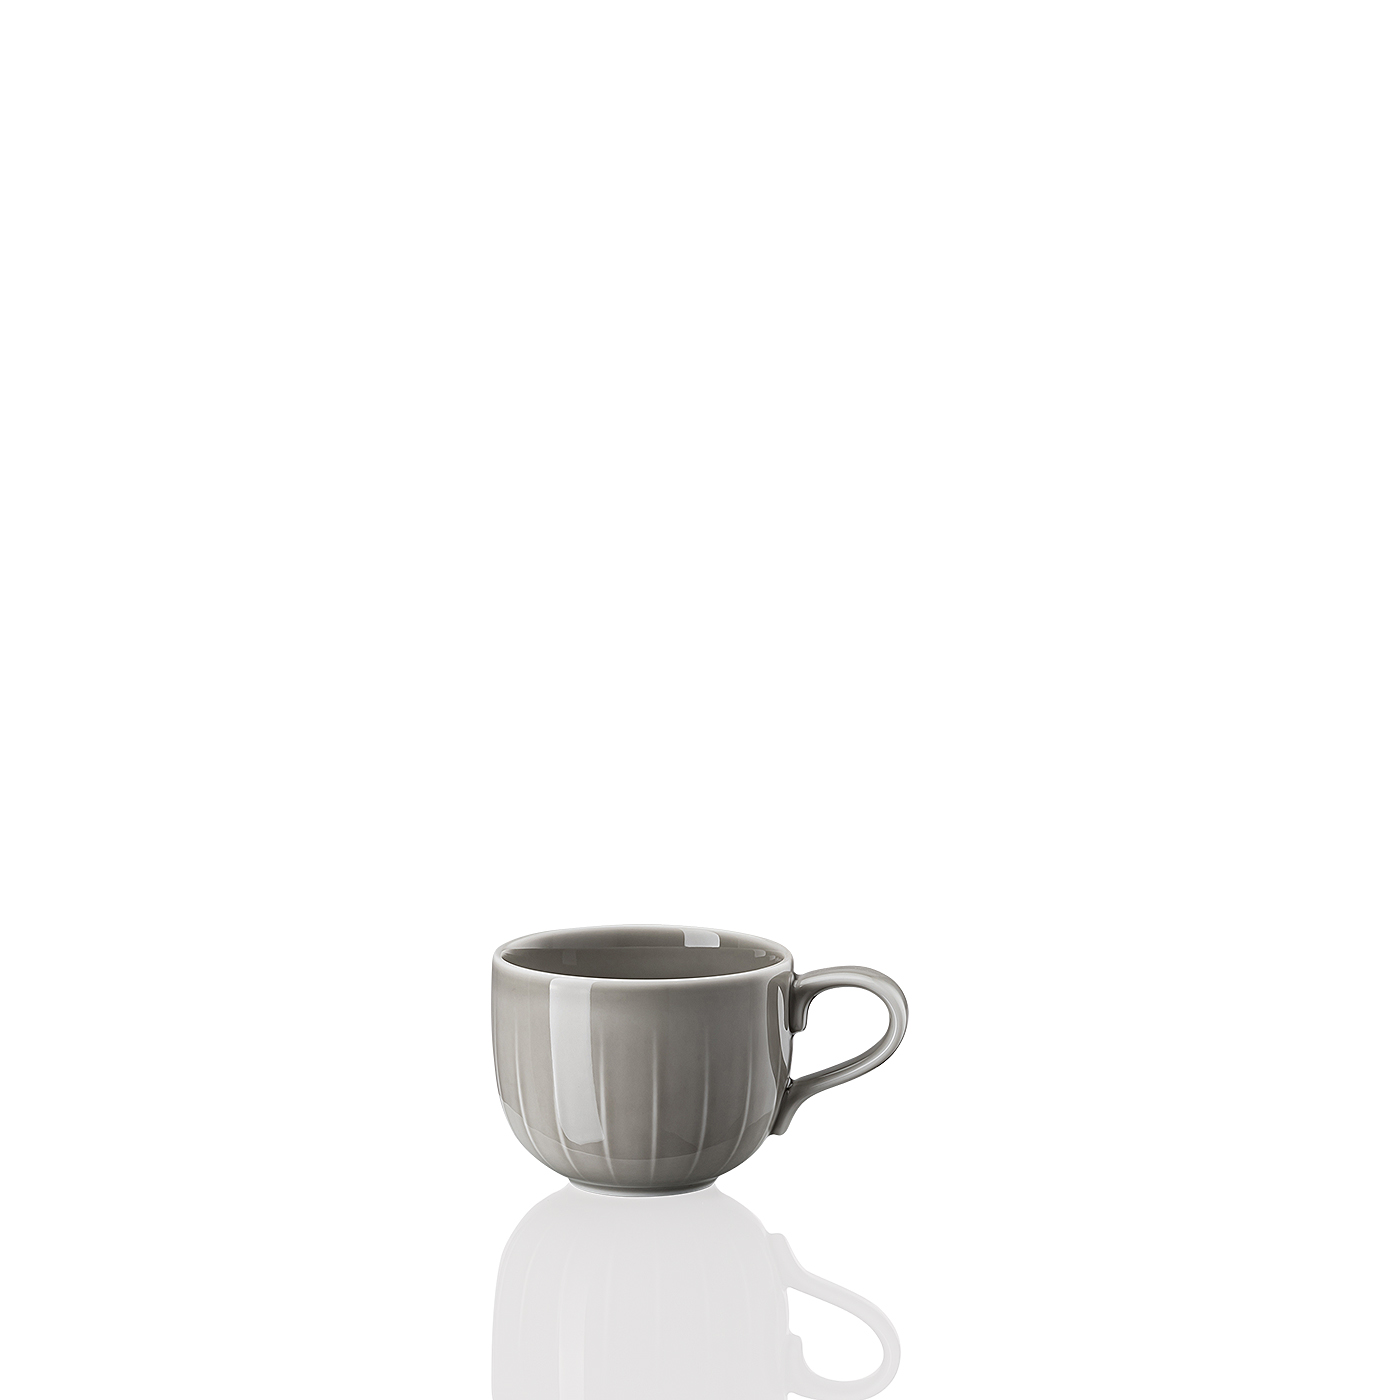 Kaffee-Obertasse Joyn Grau Arzberg